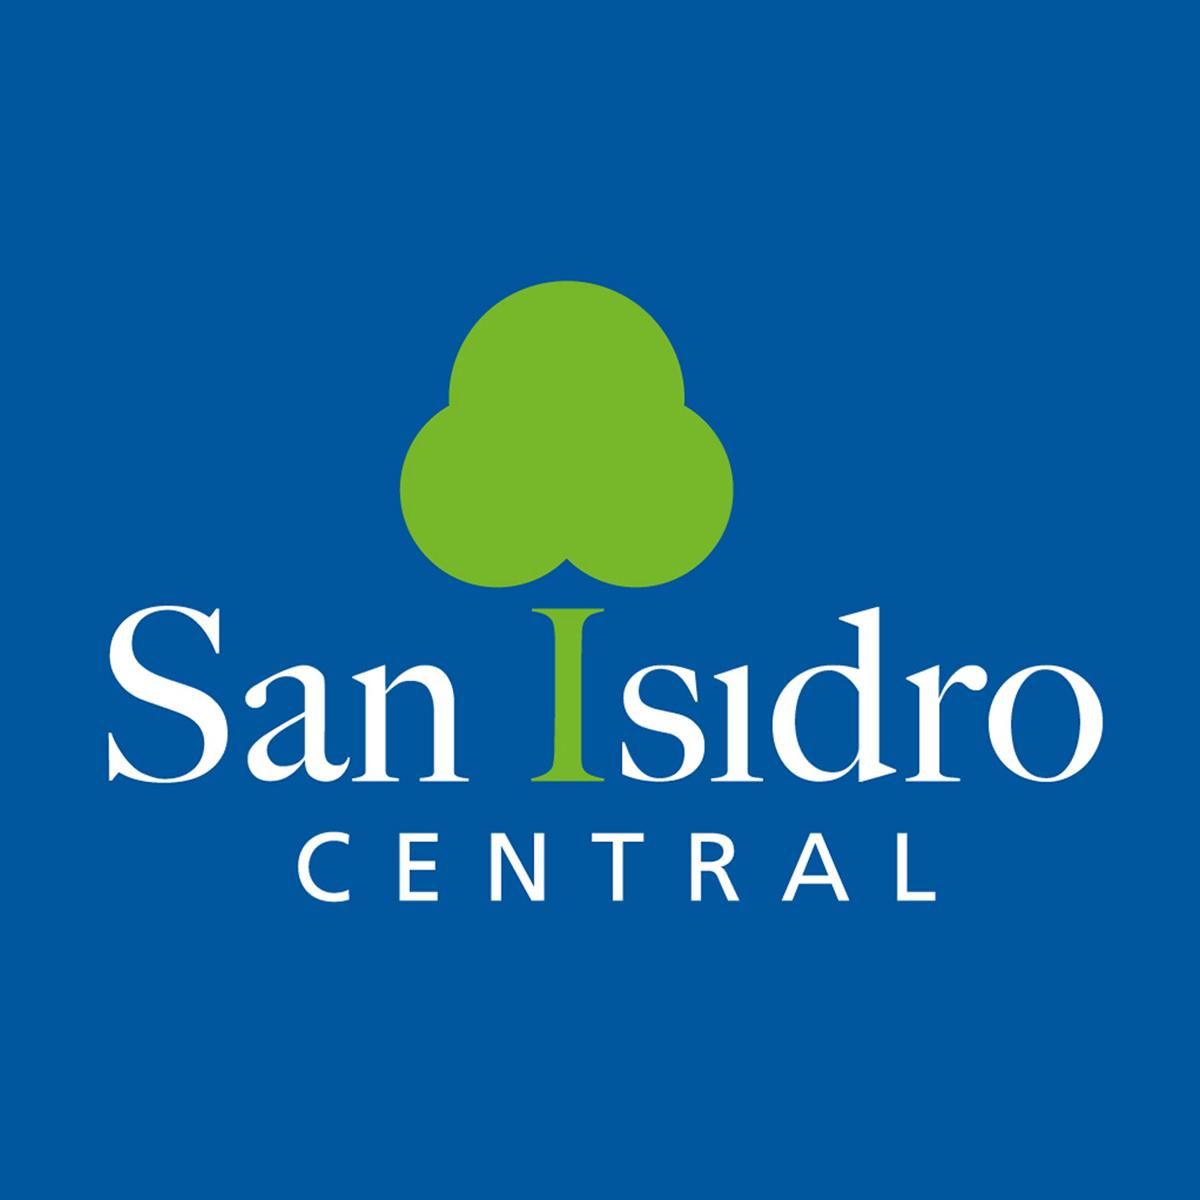 San Isidro Central Identidad / Argentina / Marca